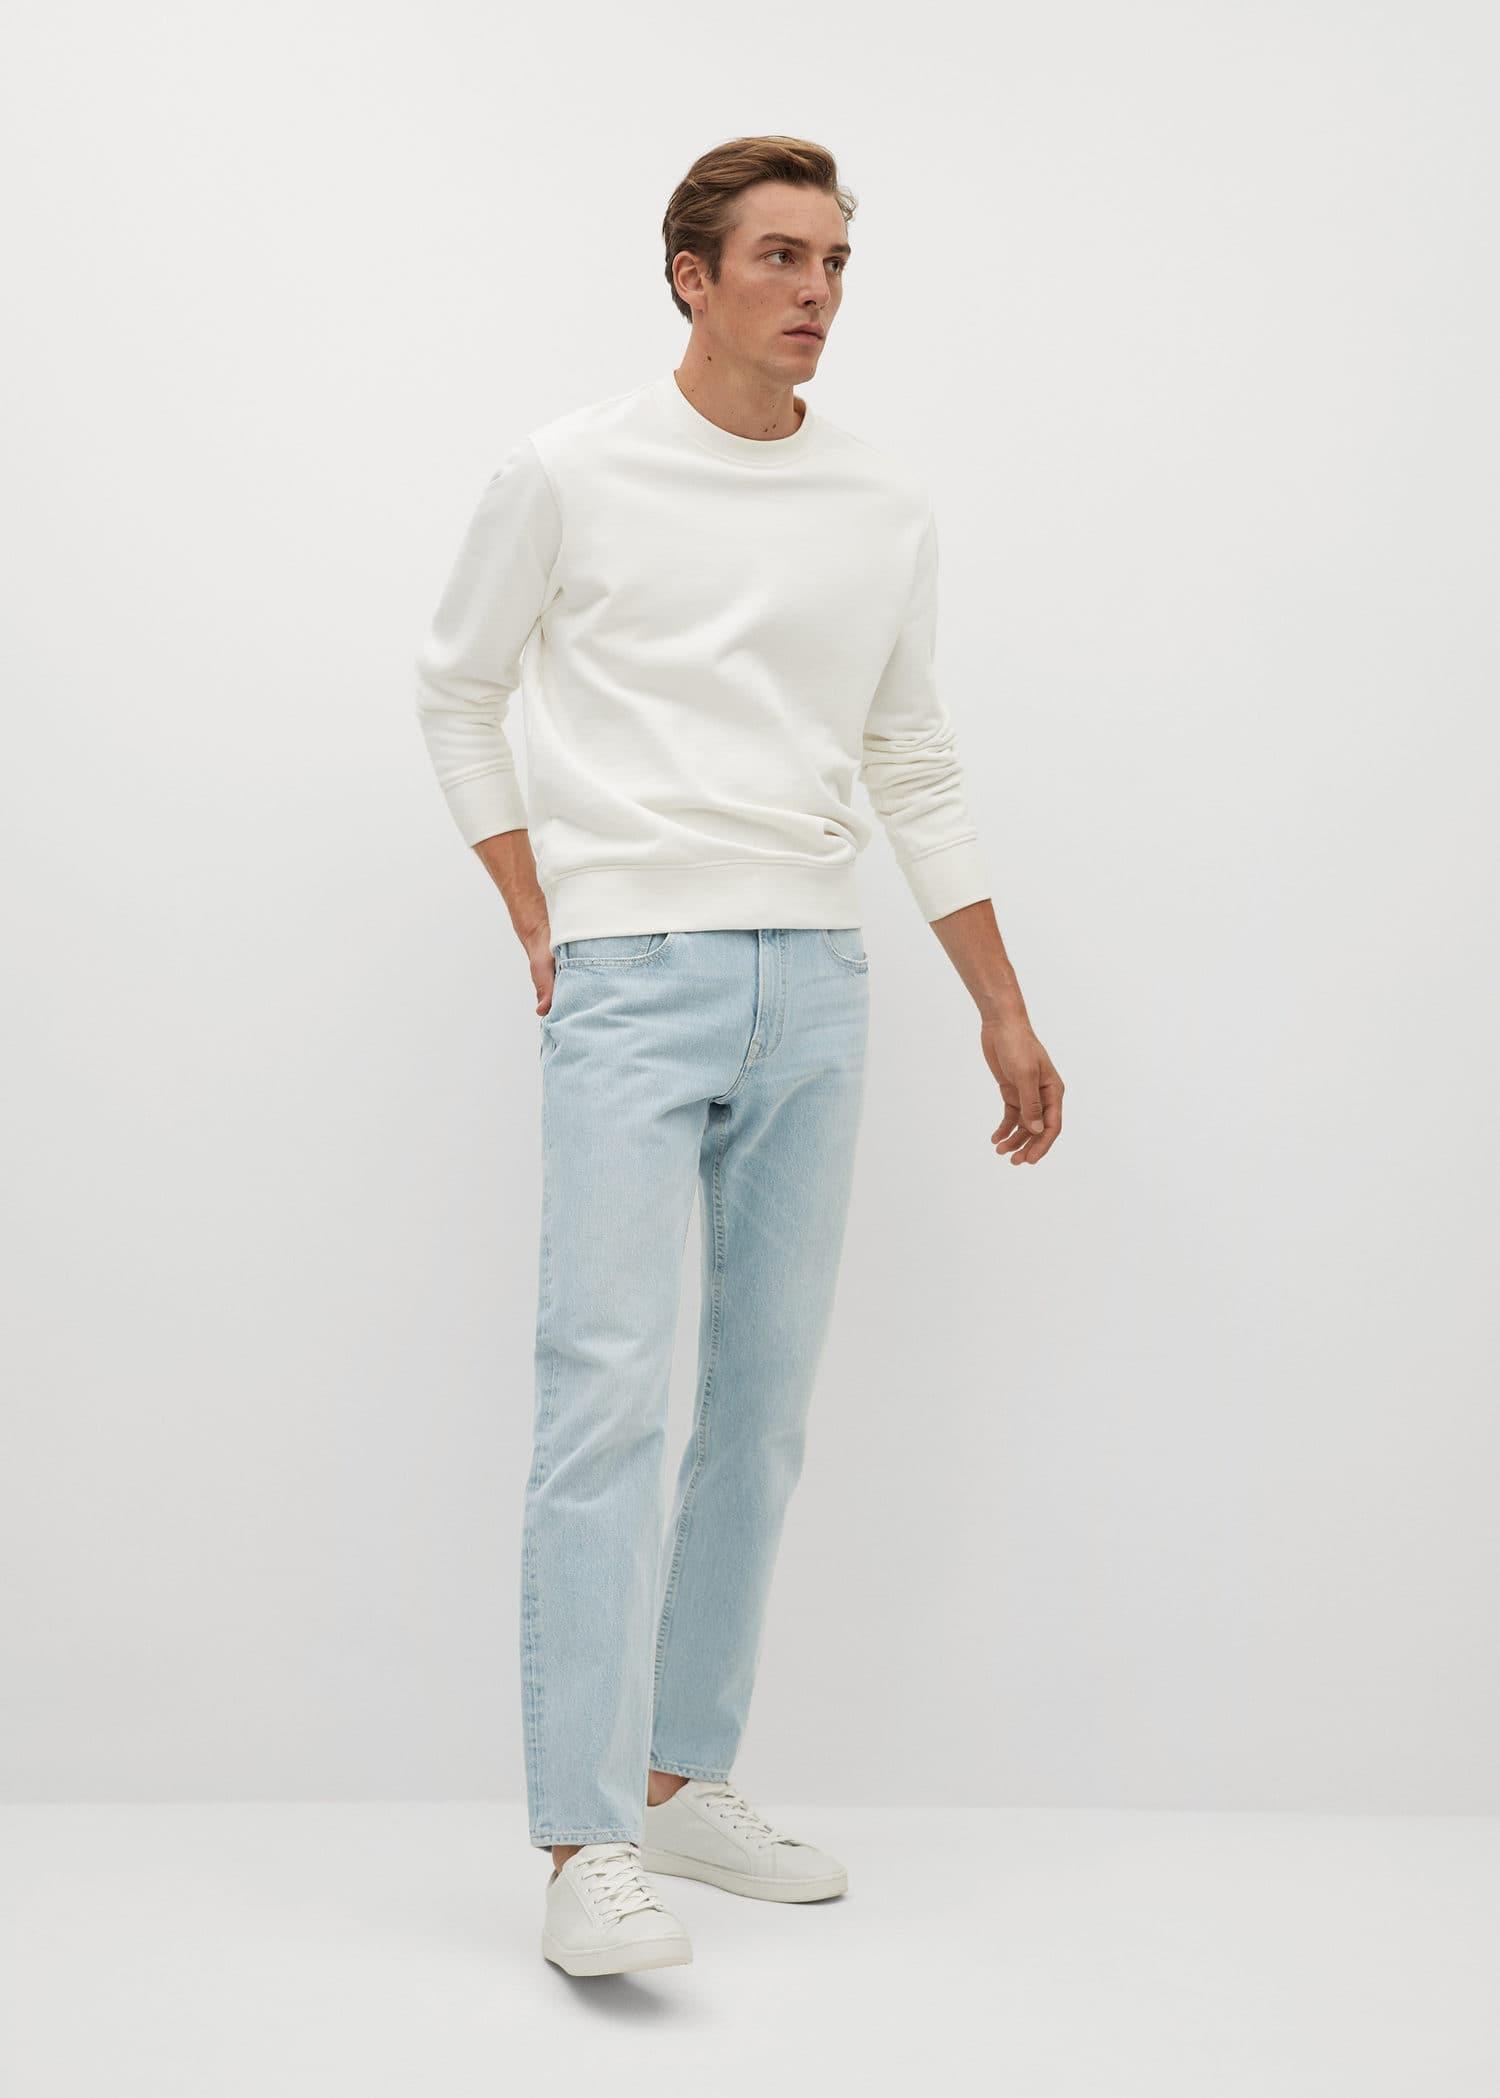 Jeans bob regular fit lys vask Menn | Mango Man Norge